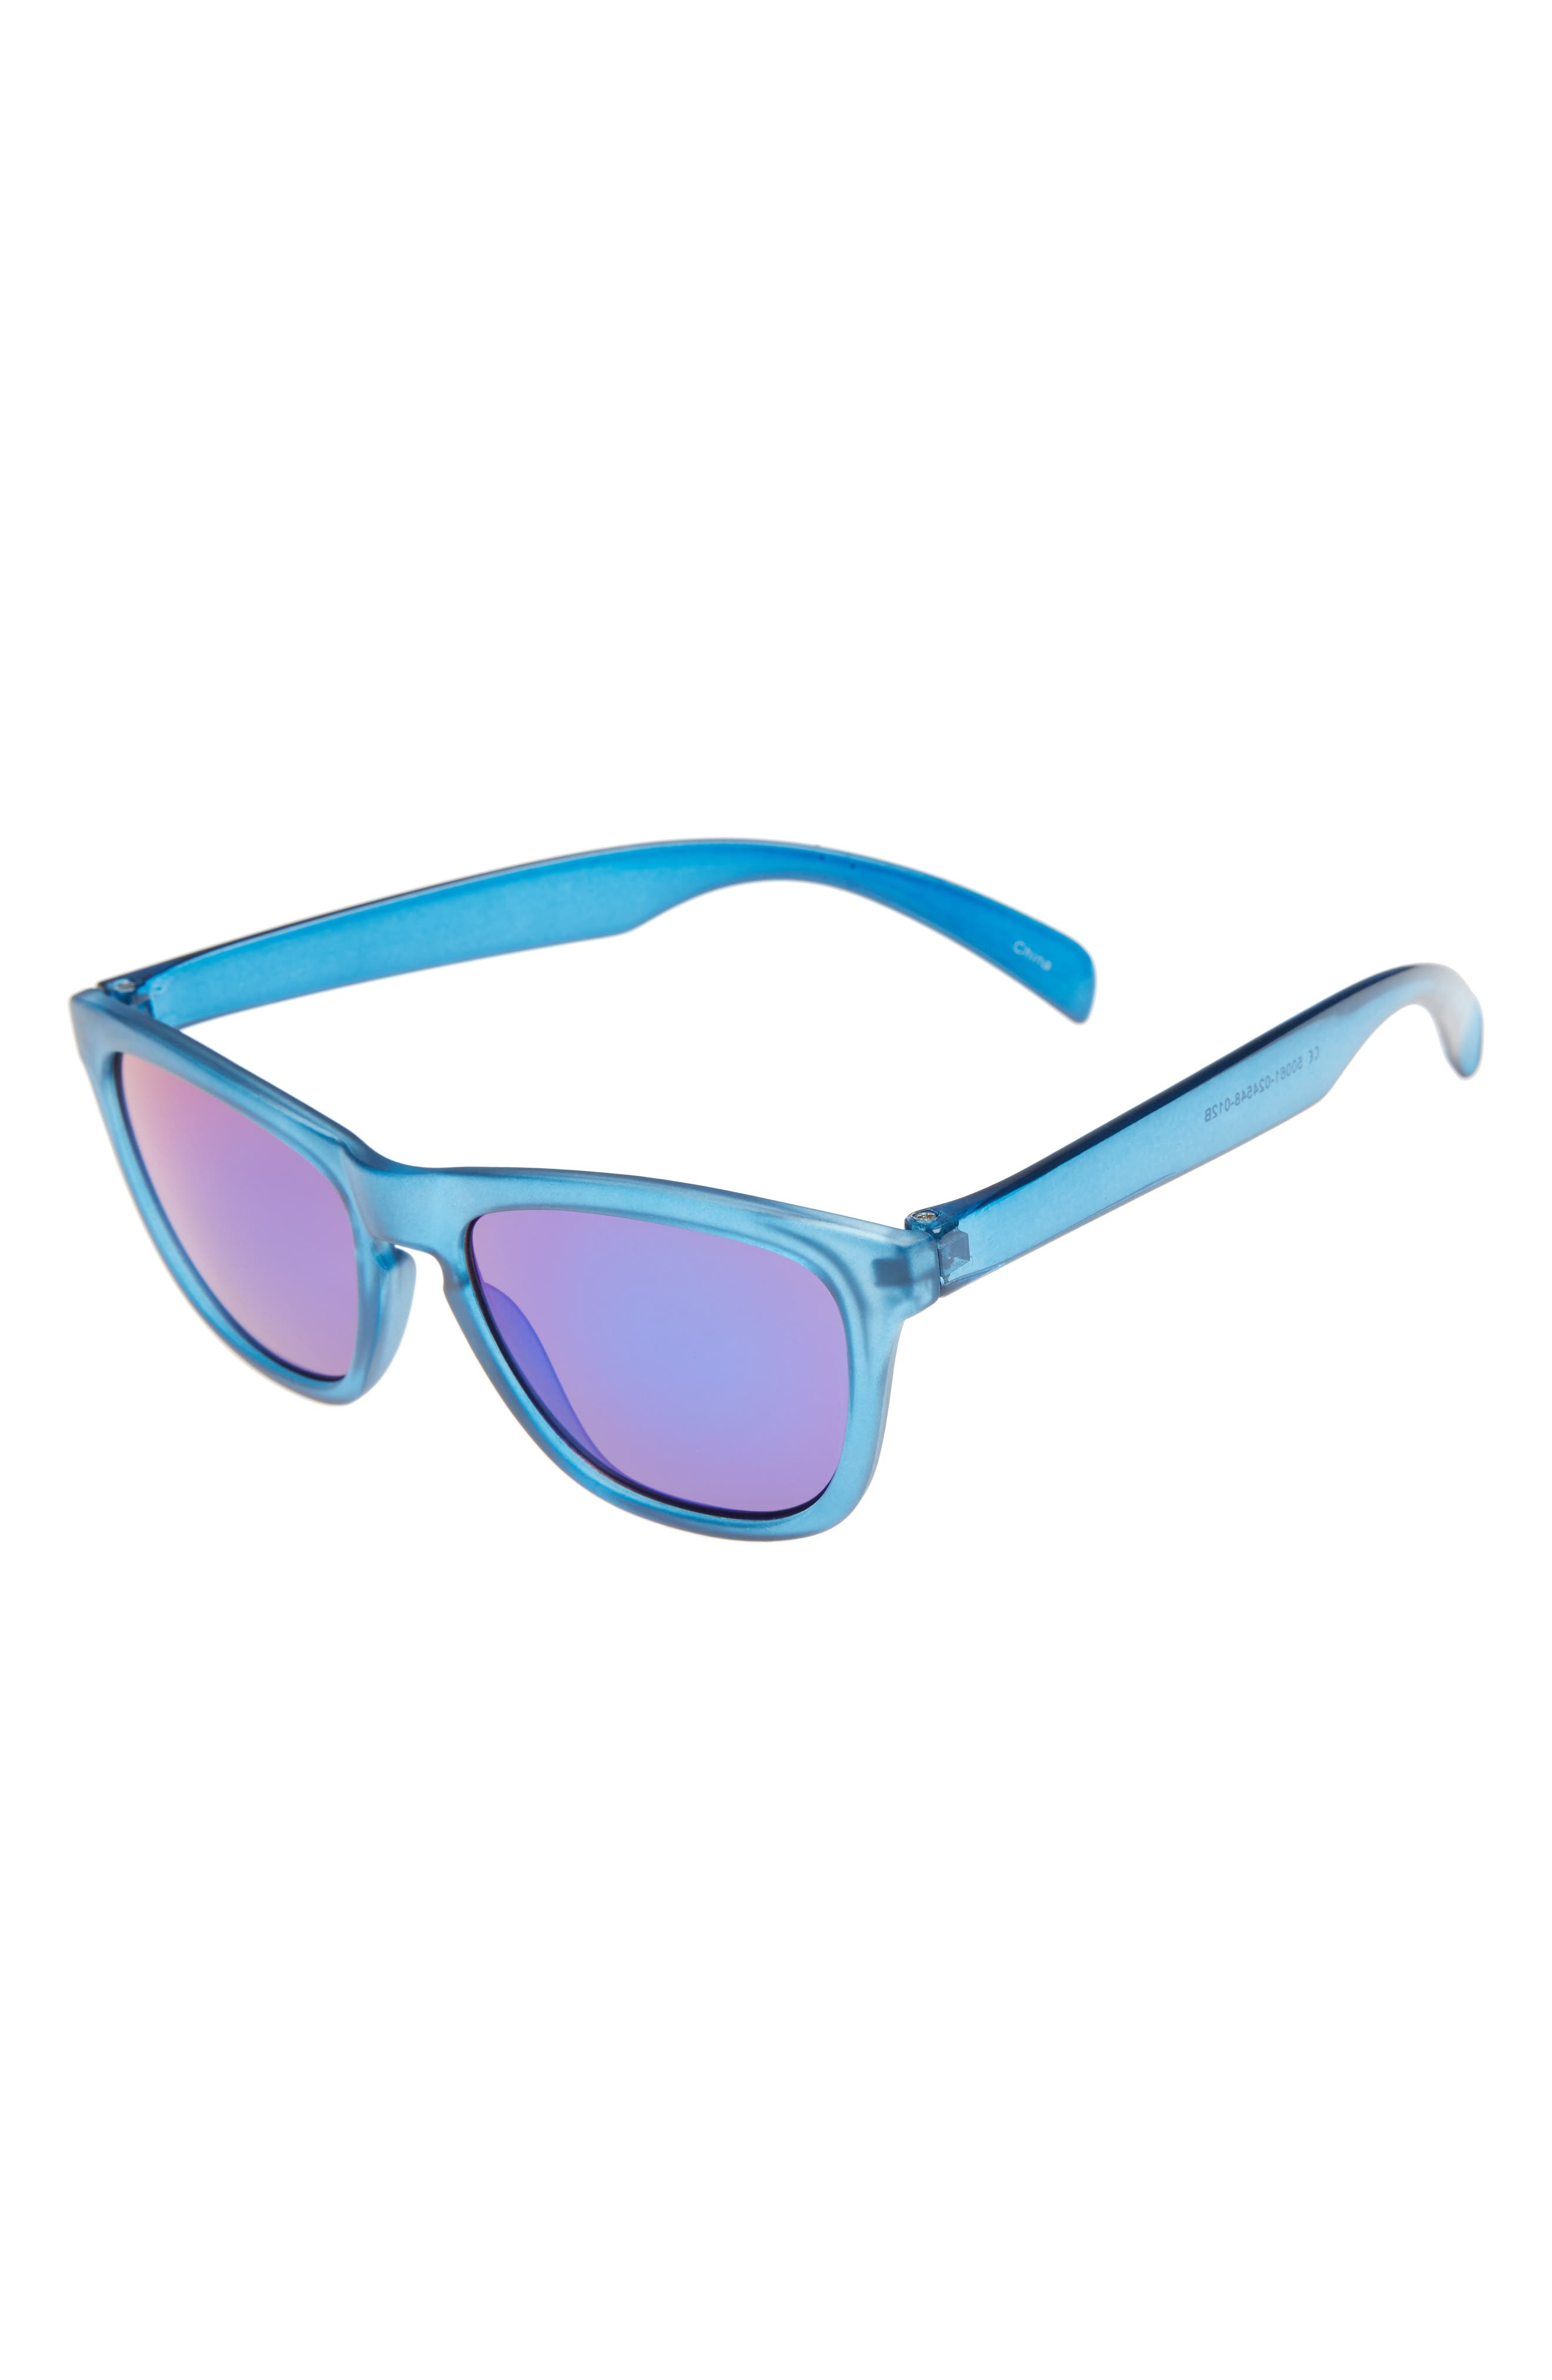 ICON EYEWEAR Mirrored Sunglasses